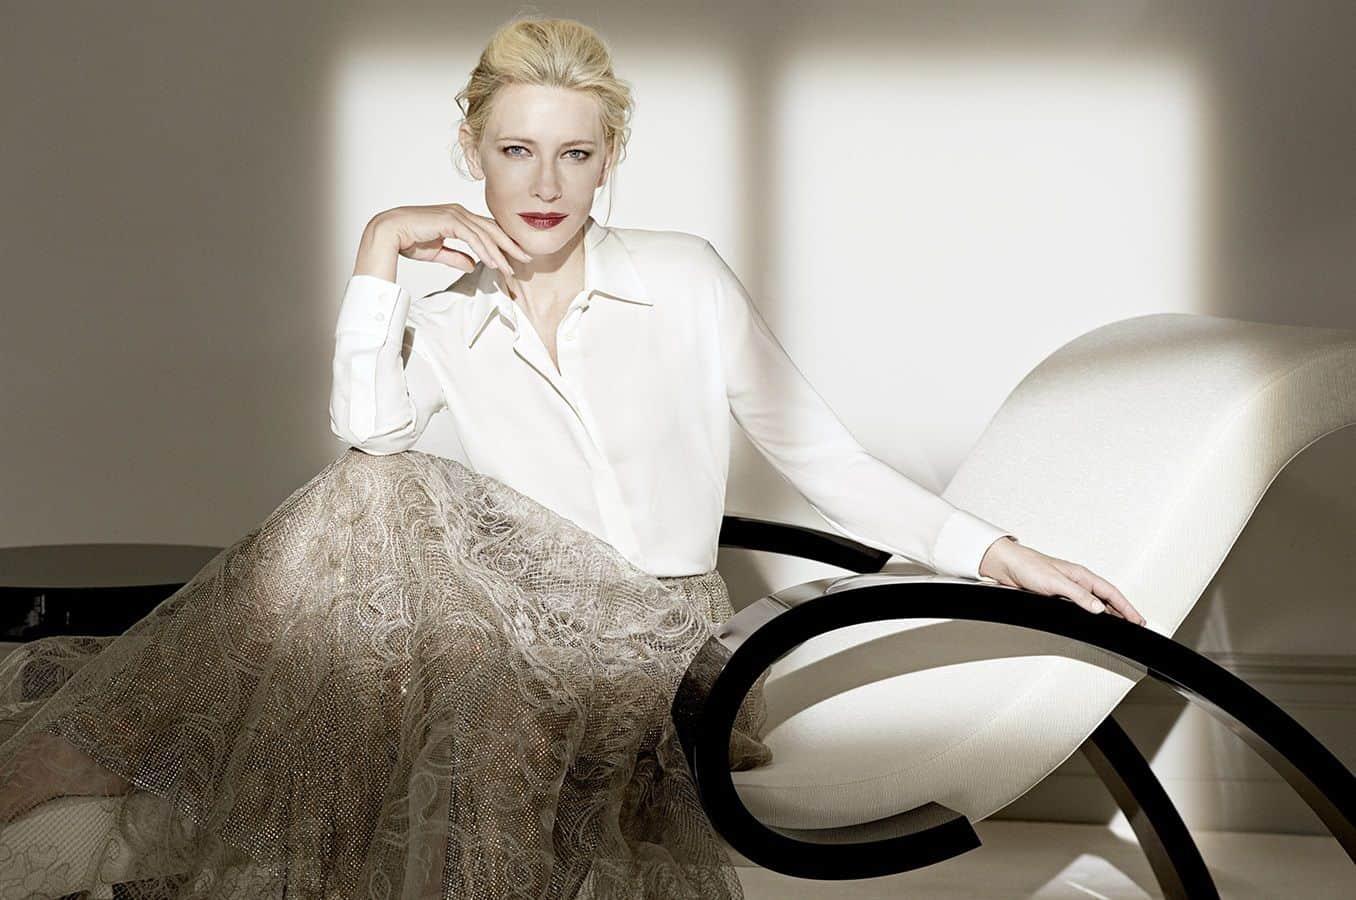 Cate Blanchett5, Hay una lesbiana en mi sopa